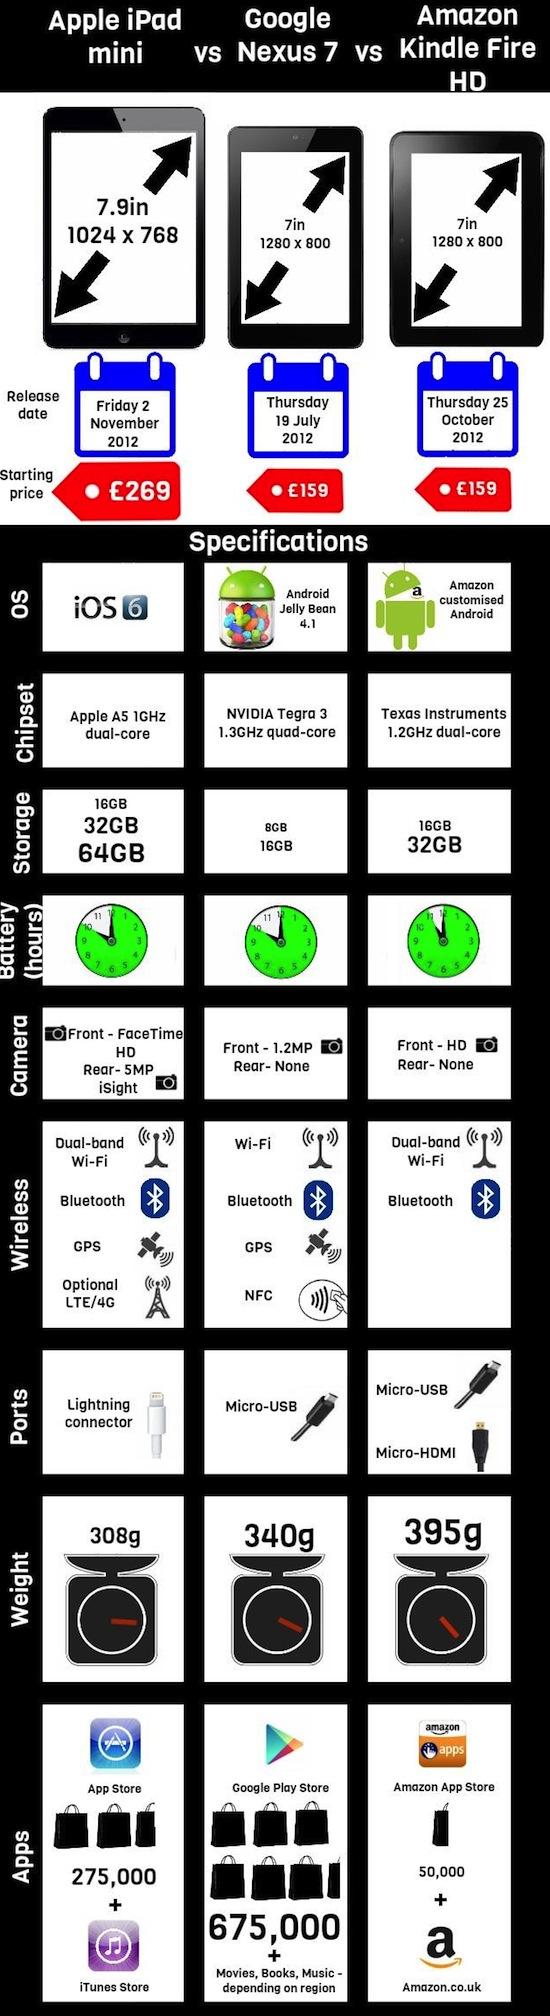 Apple iPad mini vs Google Nexus 7 vs Amazon Kindle Fire HD